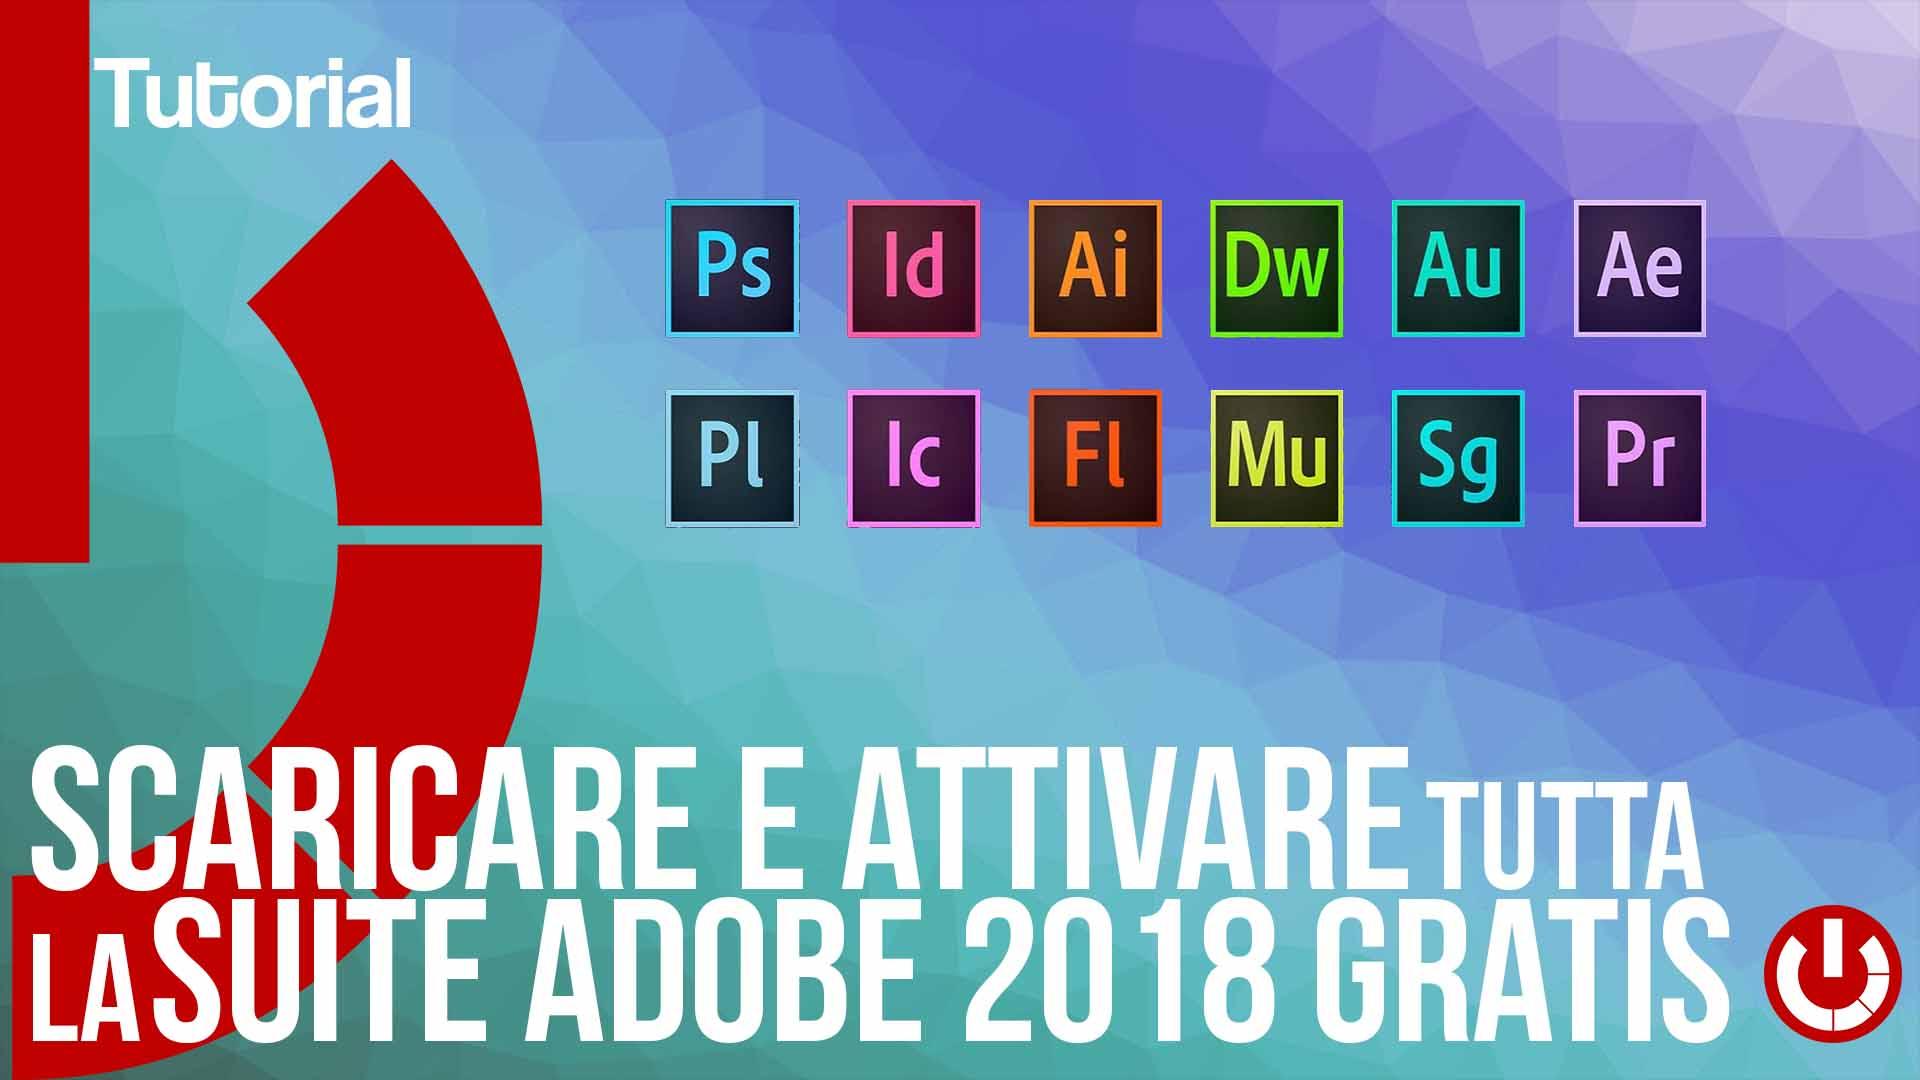 adobe 2017 gratis amtlib.dll gratis photoshop gratis illustrator gratis craccare adobe